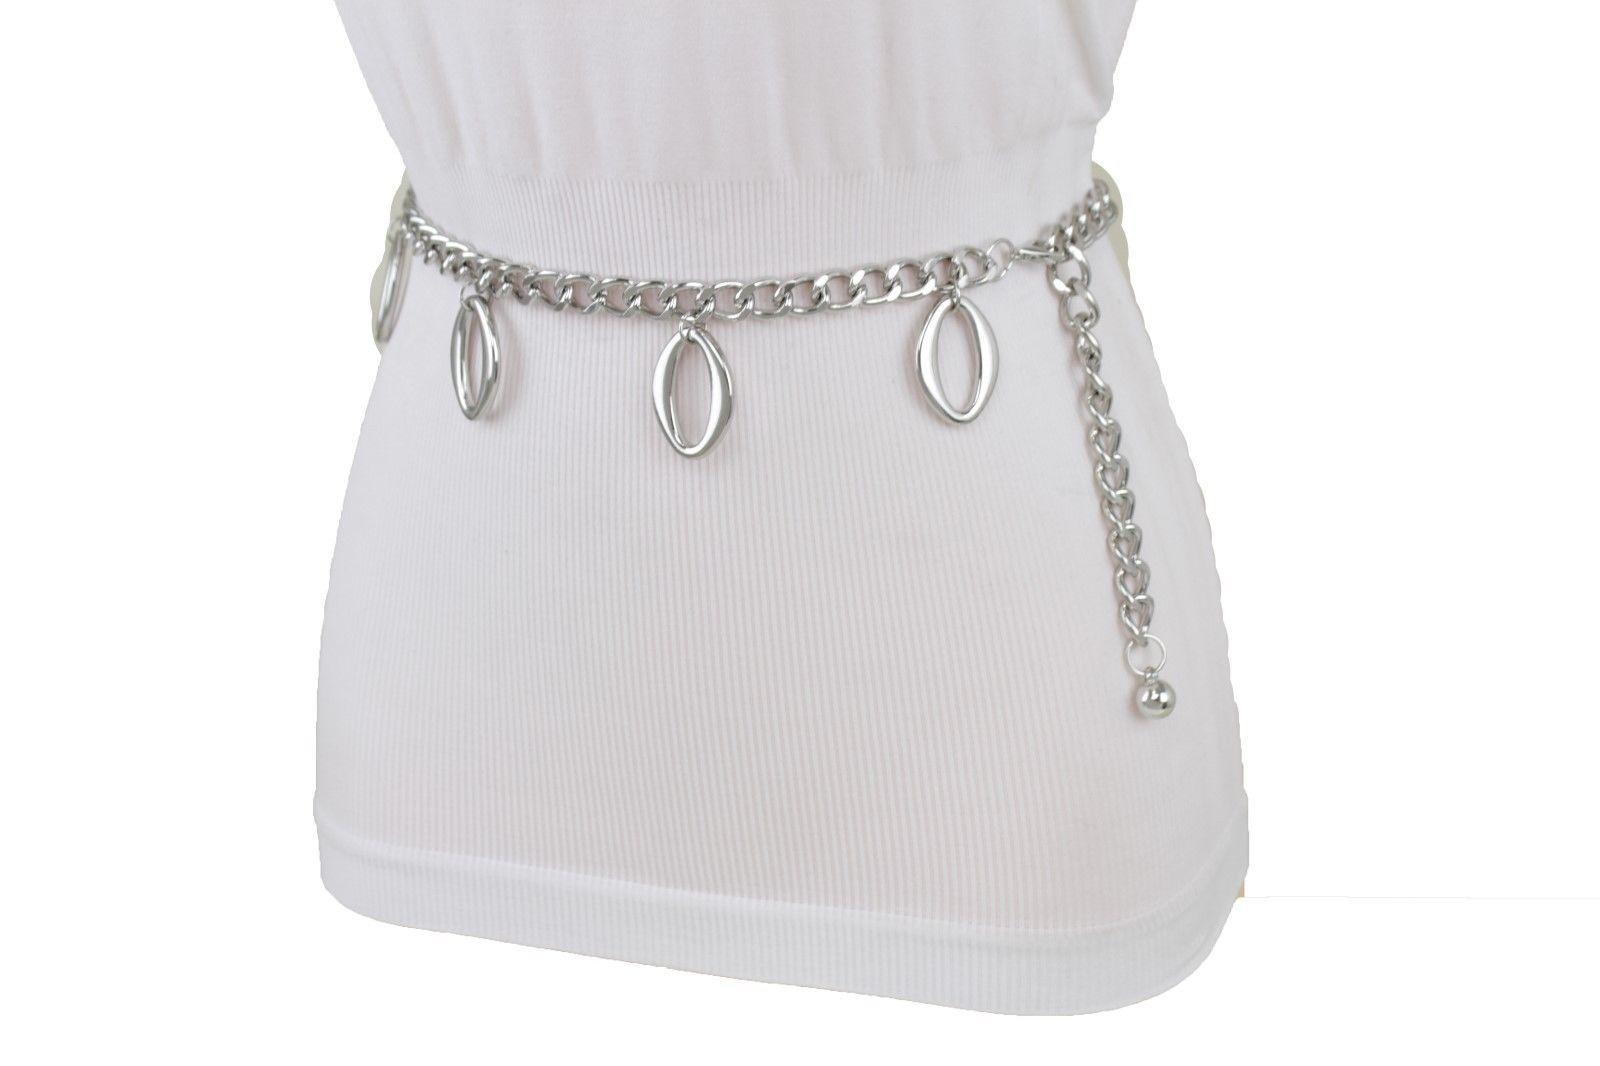 Sexy Women Narrow Belt Silver Metal Chain Oval Shape Charms Dangle XS S M L XL